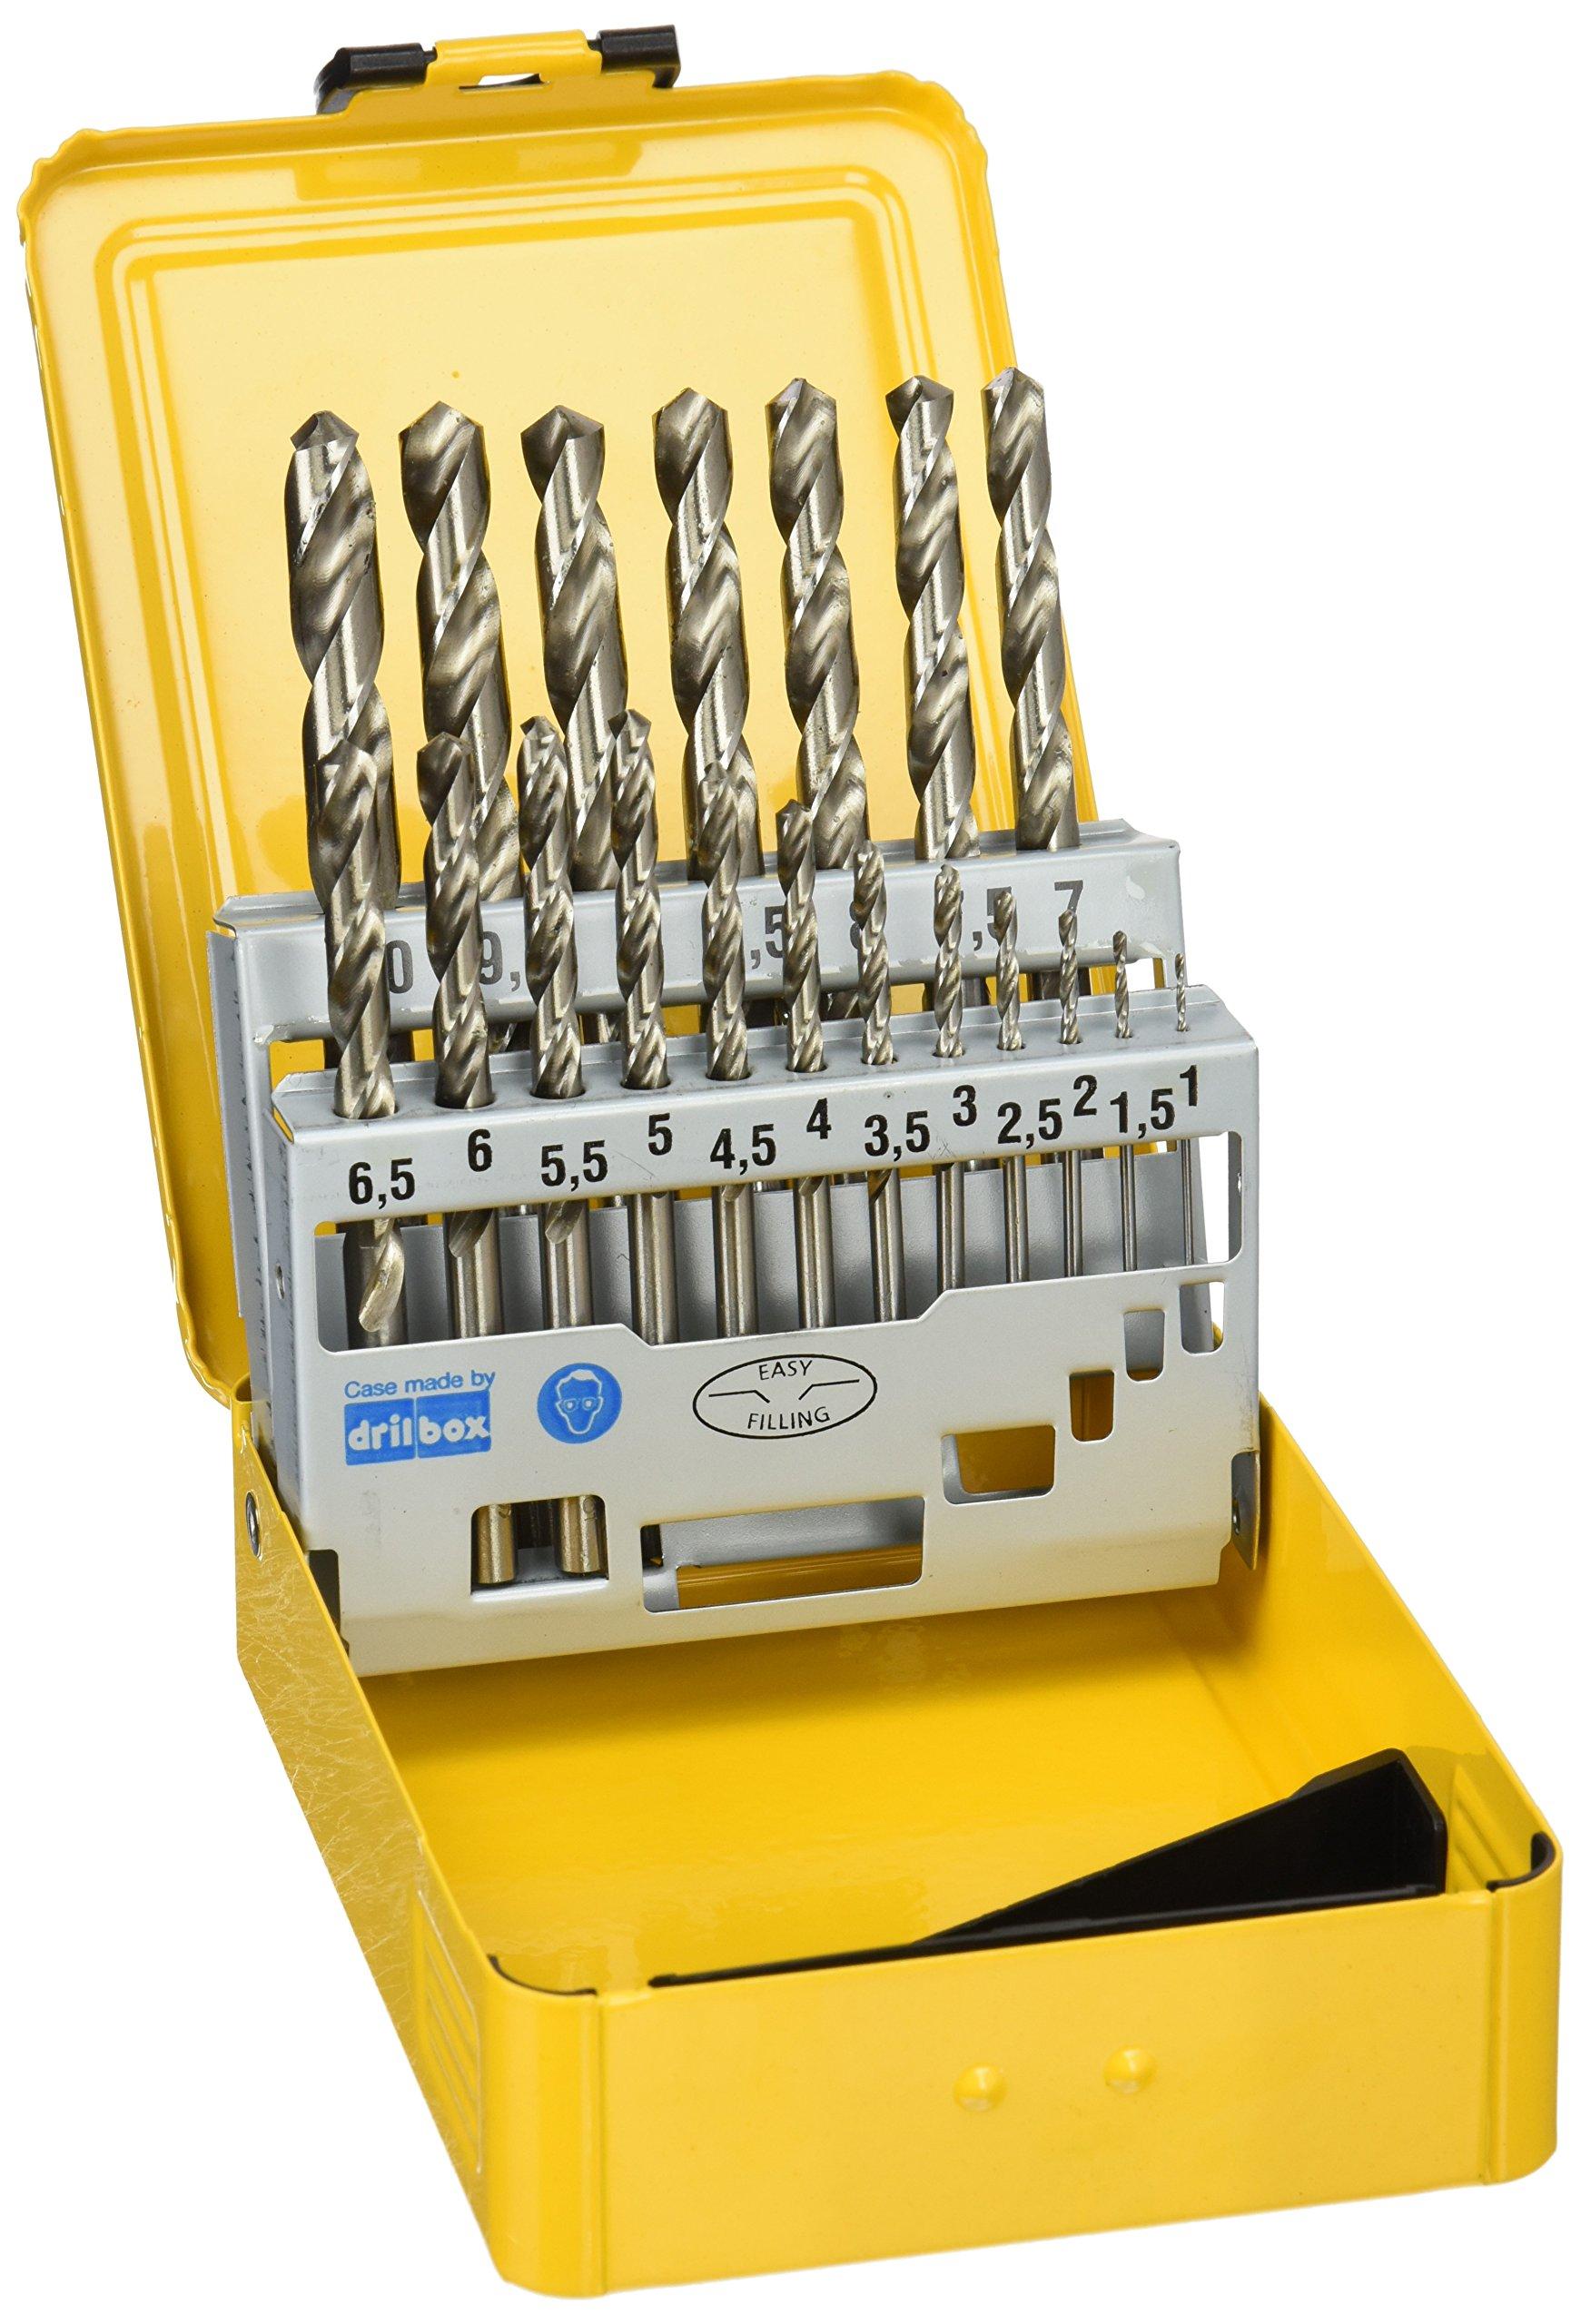 Dewalt DT5923-QZ Metal drill bit-Set (19 Piece) HSS-G